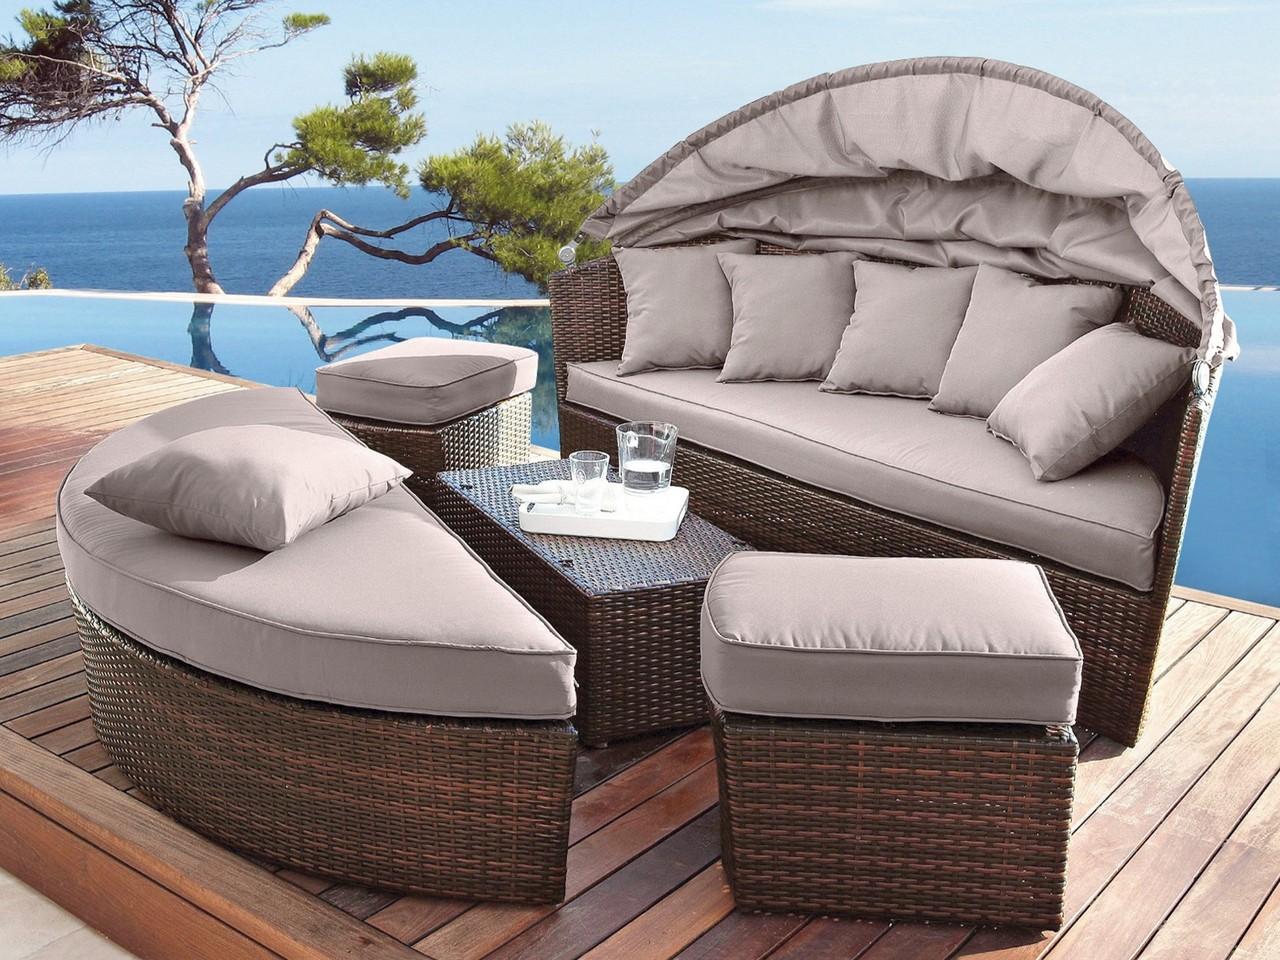 rattan inseln lamaisonrohloffs webseite. Black Bedroom Furniture Sets. Home Design Ideas